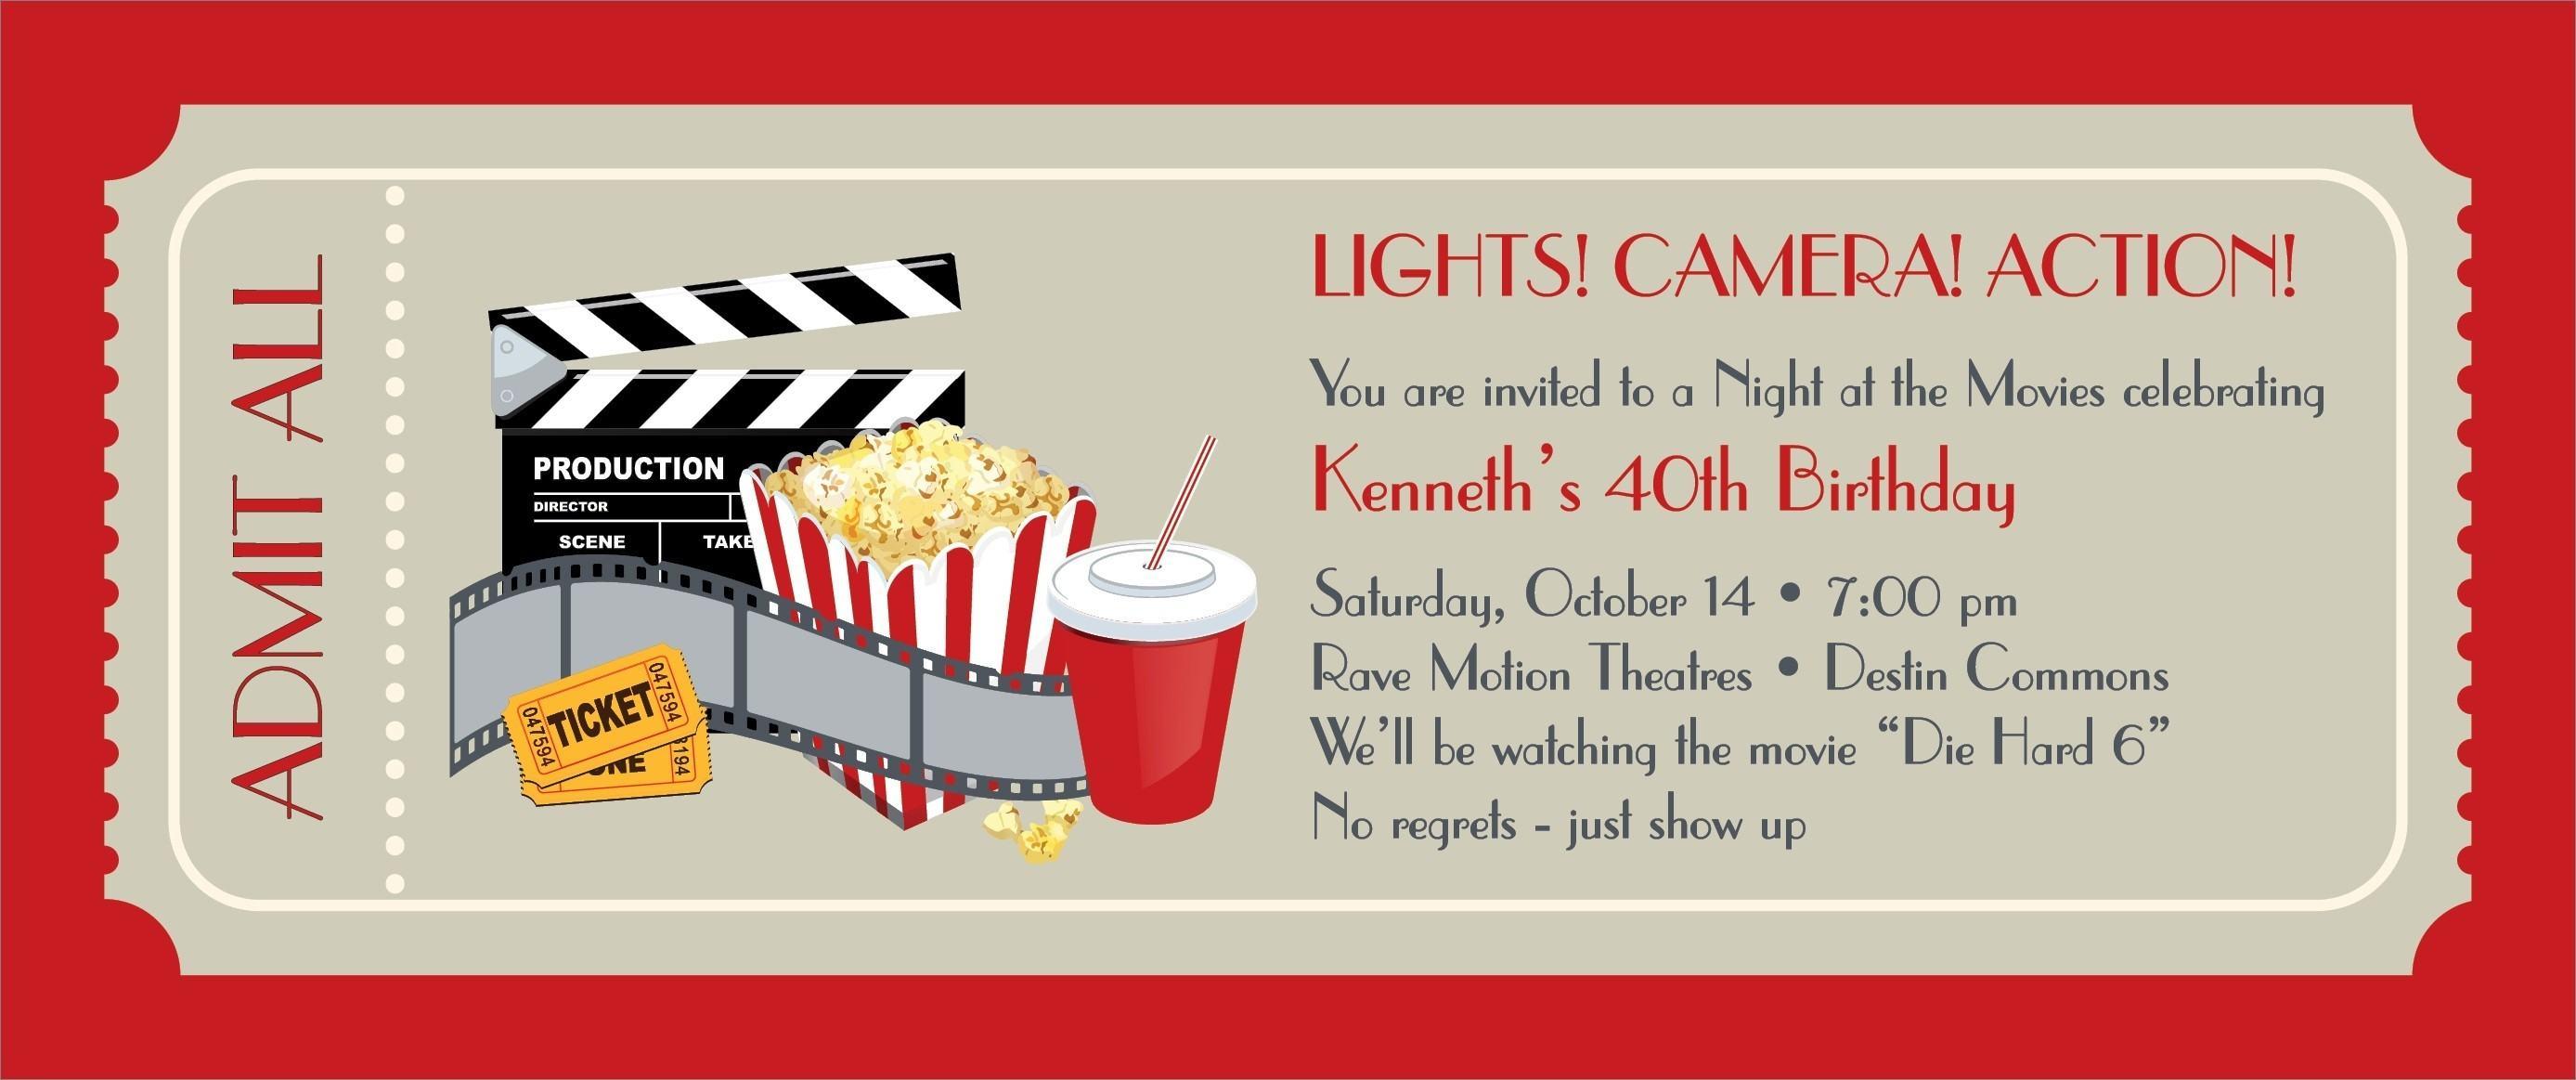 Printable Movie Ticket Invitations Free For You Invitation Templates - Free Printable Movie Ticket Birthday Party Invitations